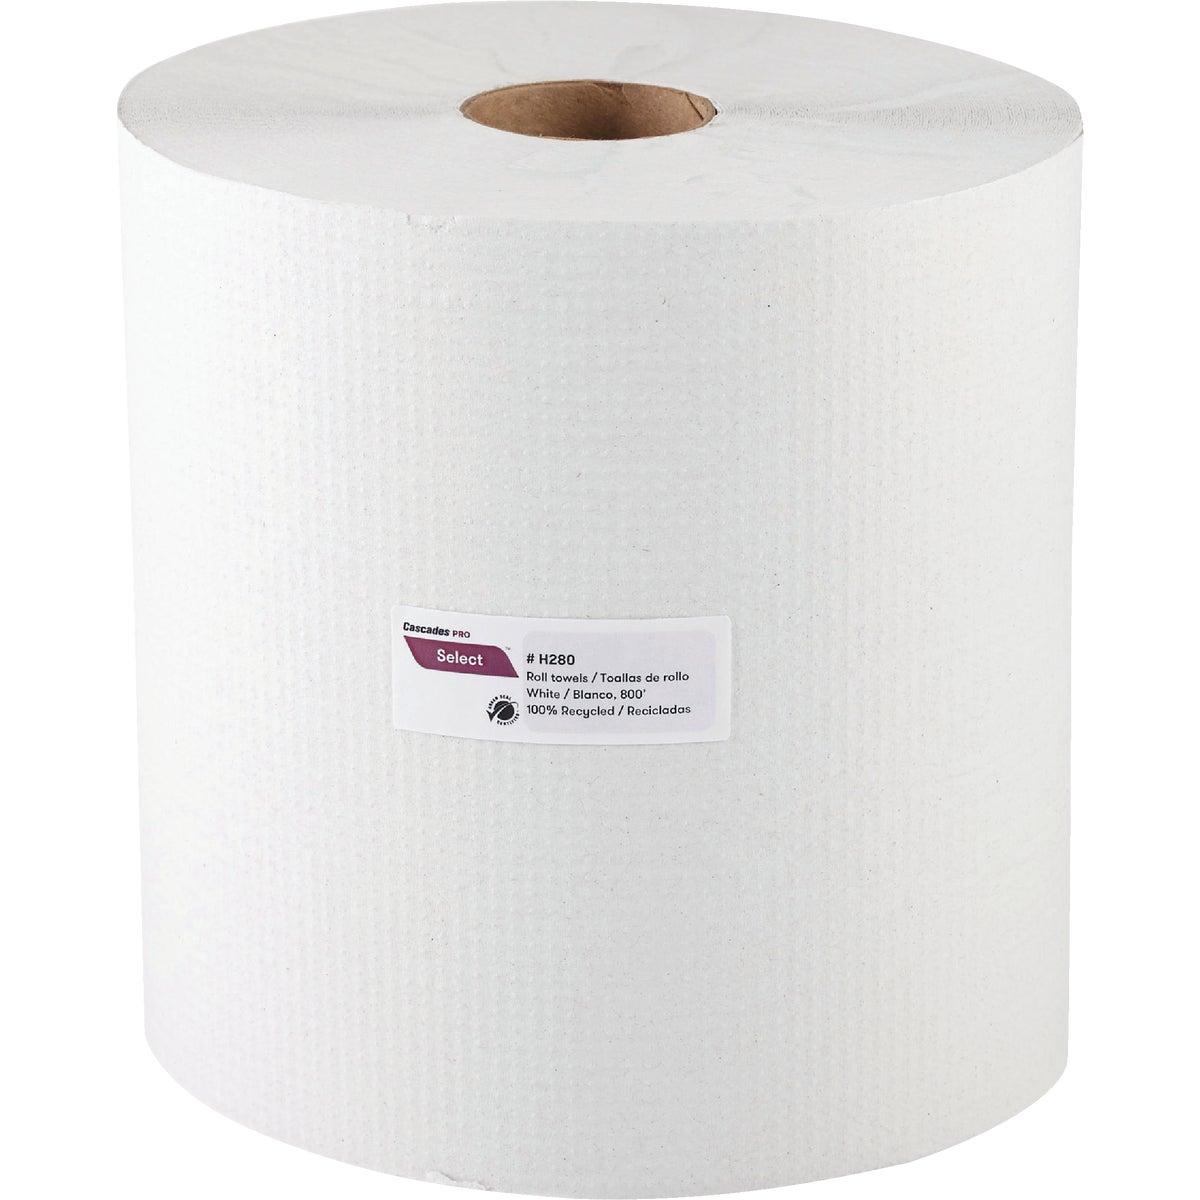 700' Wht Hard Roll Towel